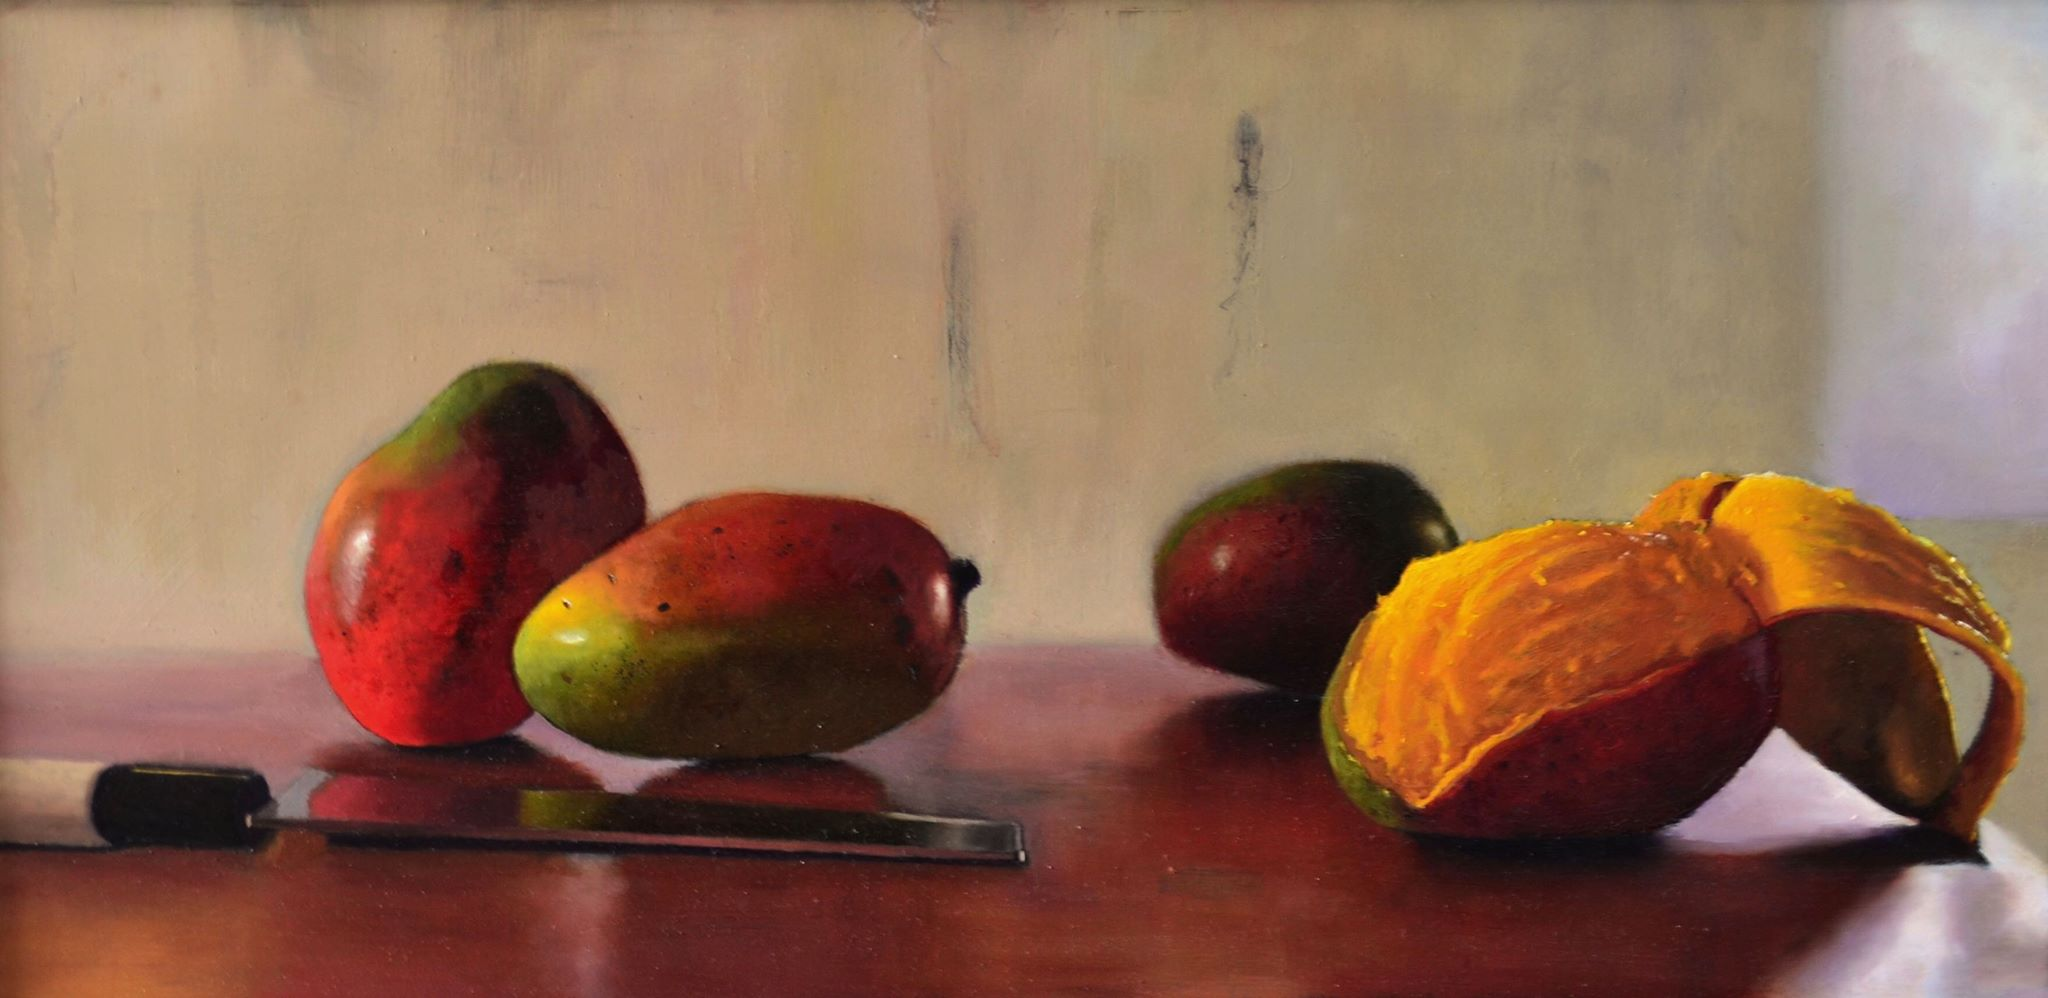 smal;l mangoes.jpg